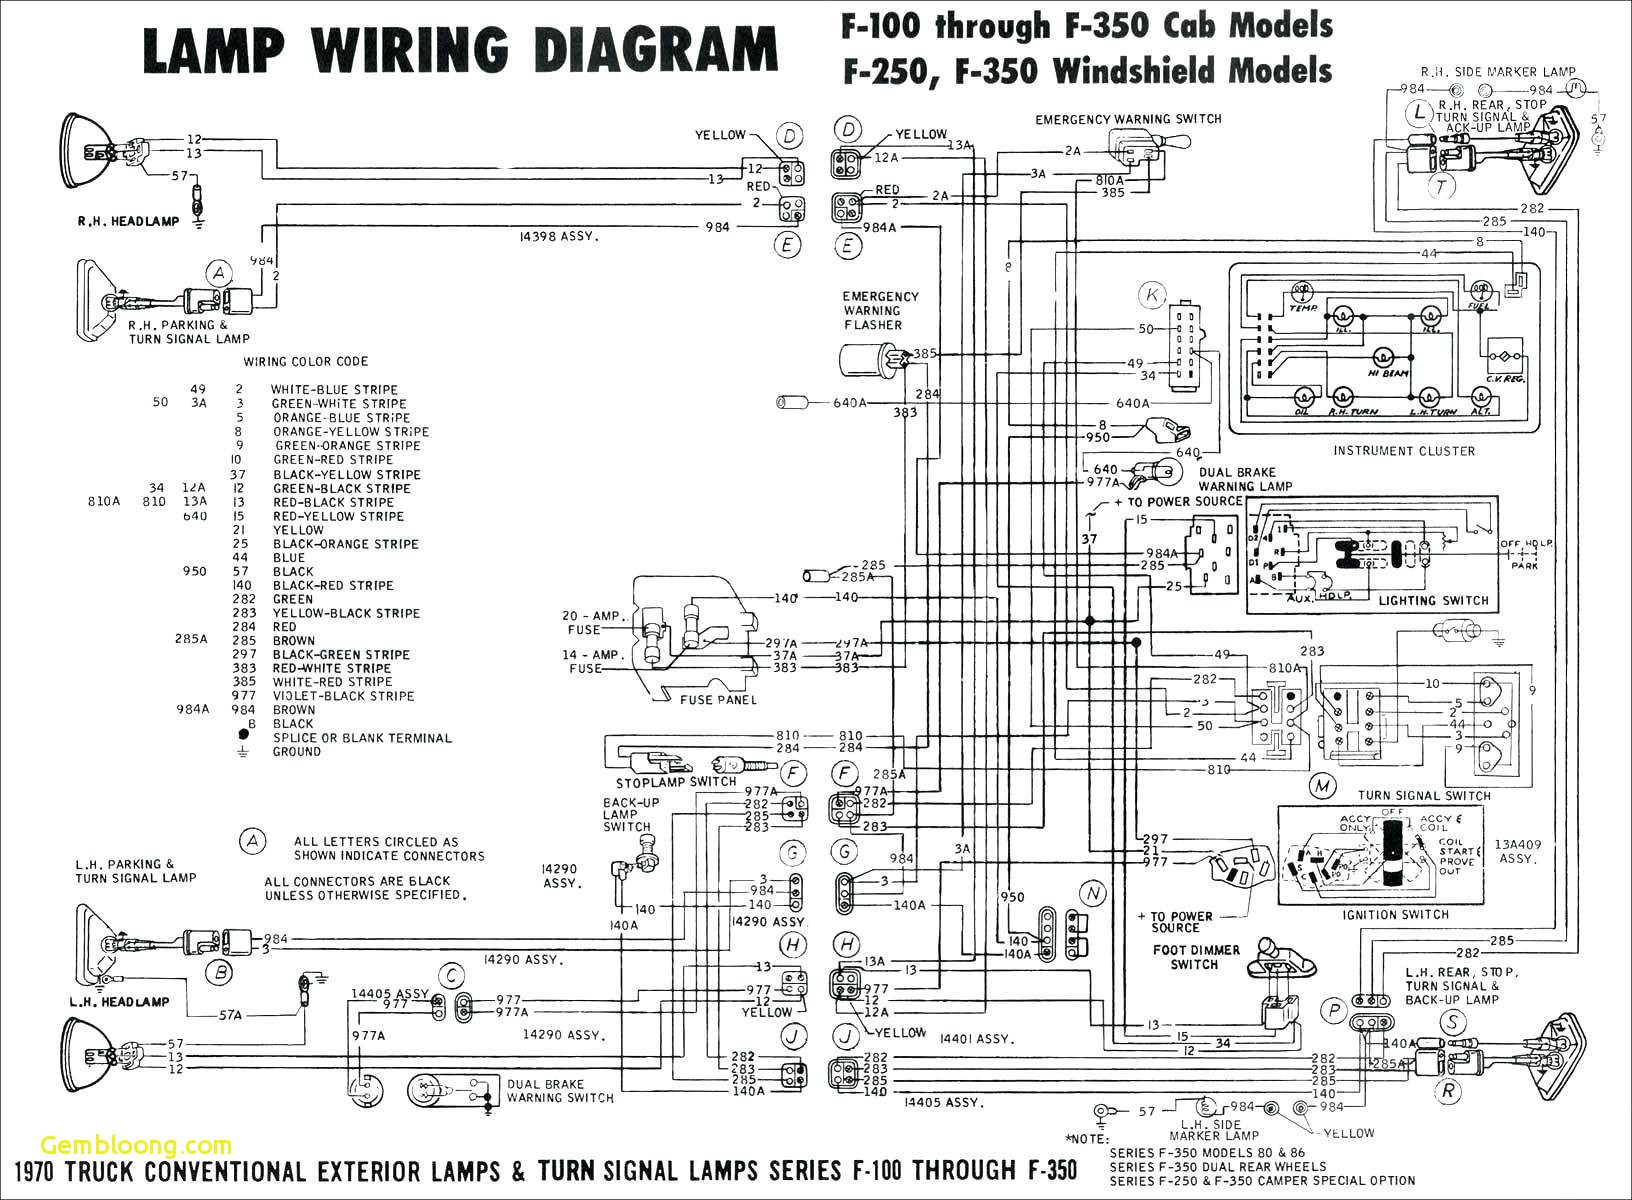 Ford Fiesta Engine Diagram Free ford Trucks Wiring Diagrams ford Wiring Diagrams Free Free Of Ford Fiesta Engine Diagram